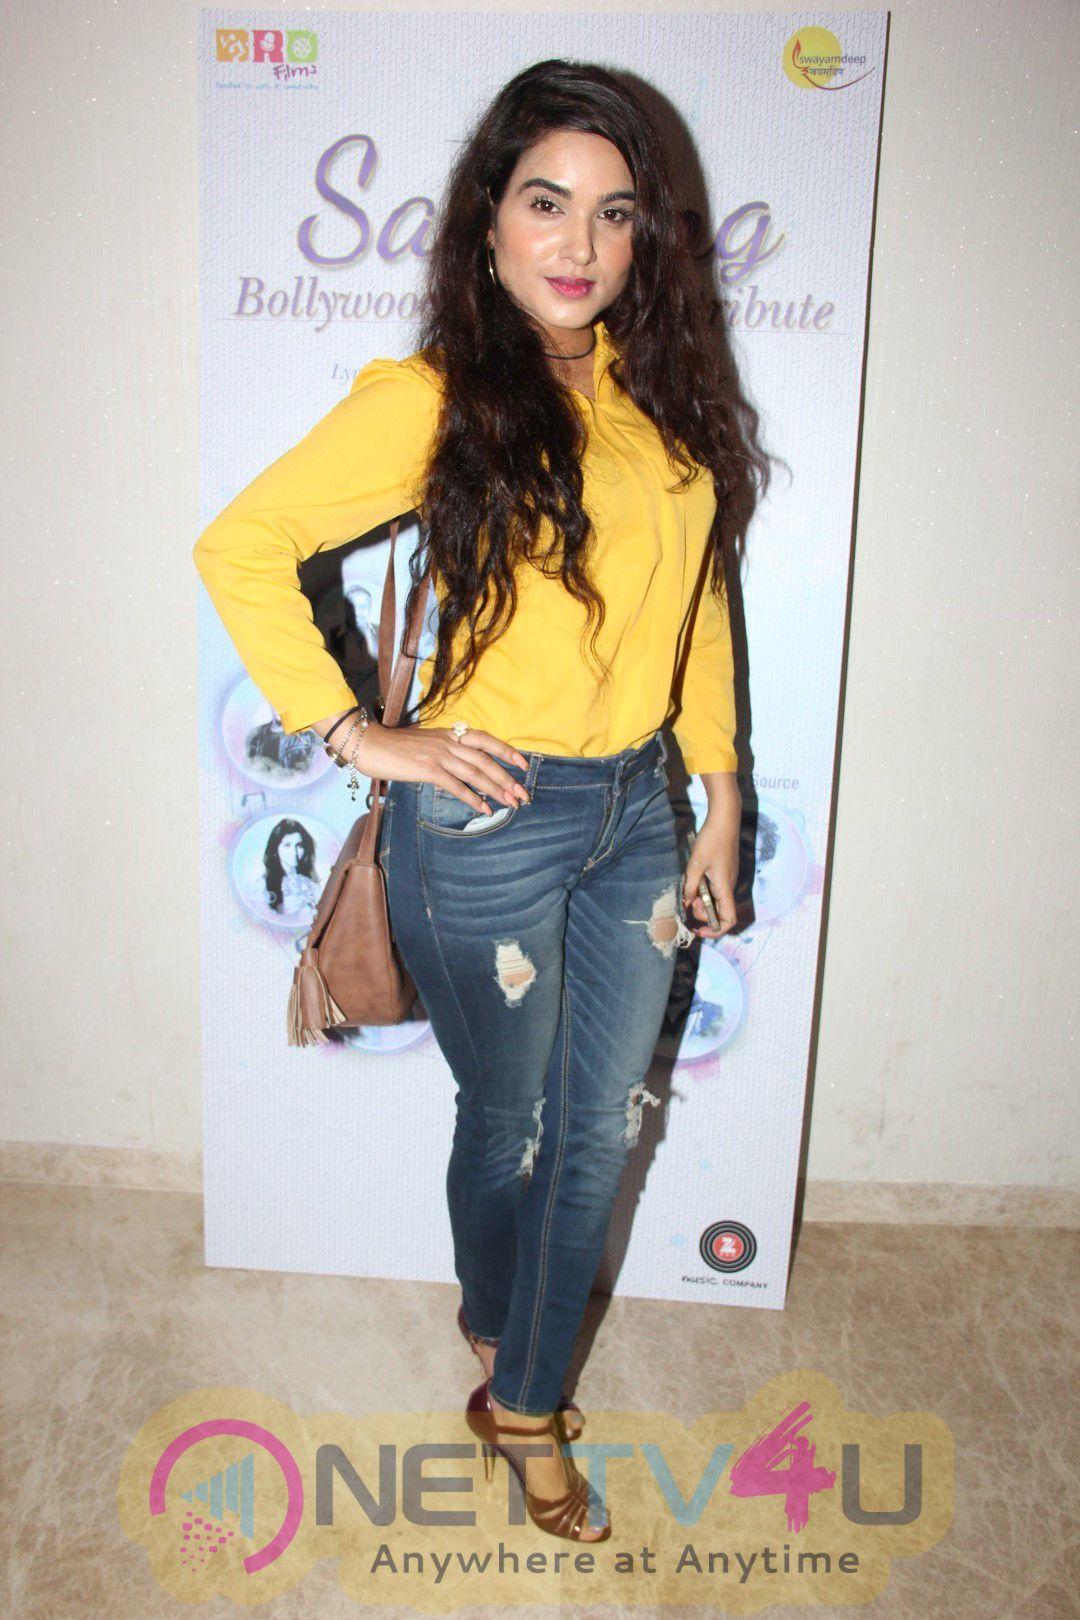 Launch Of Album Sarnang With Jeetendra & Shaan Stills Hindi Gallery